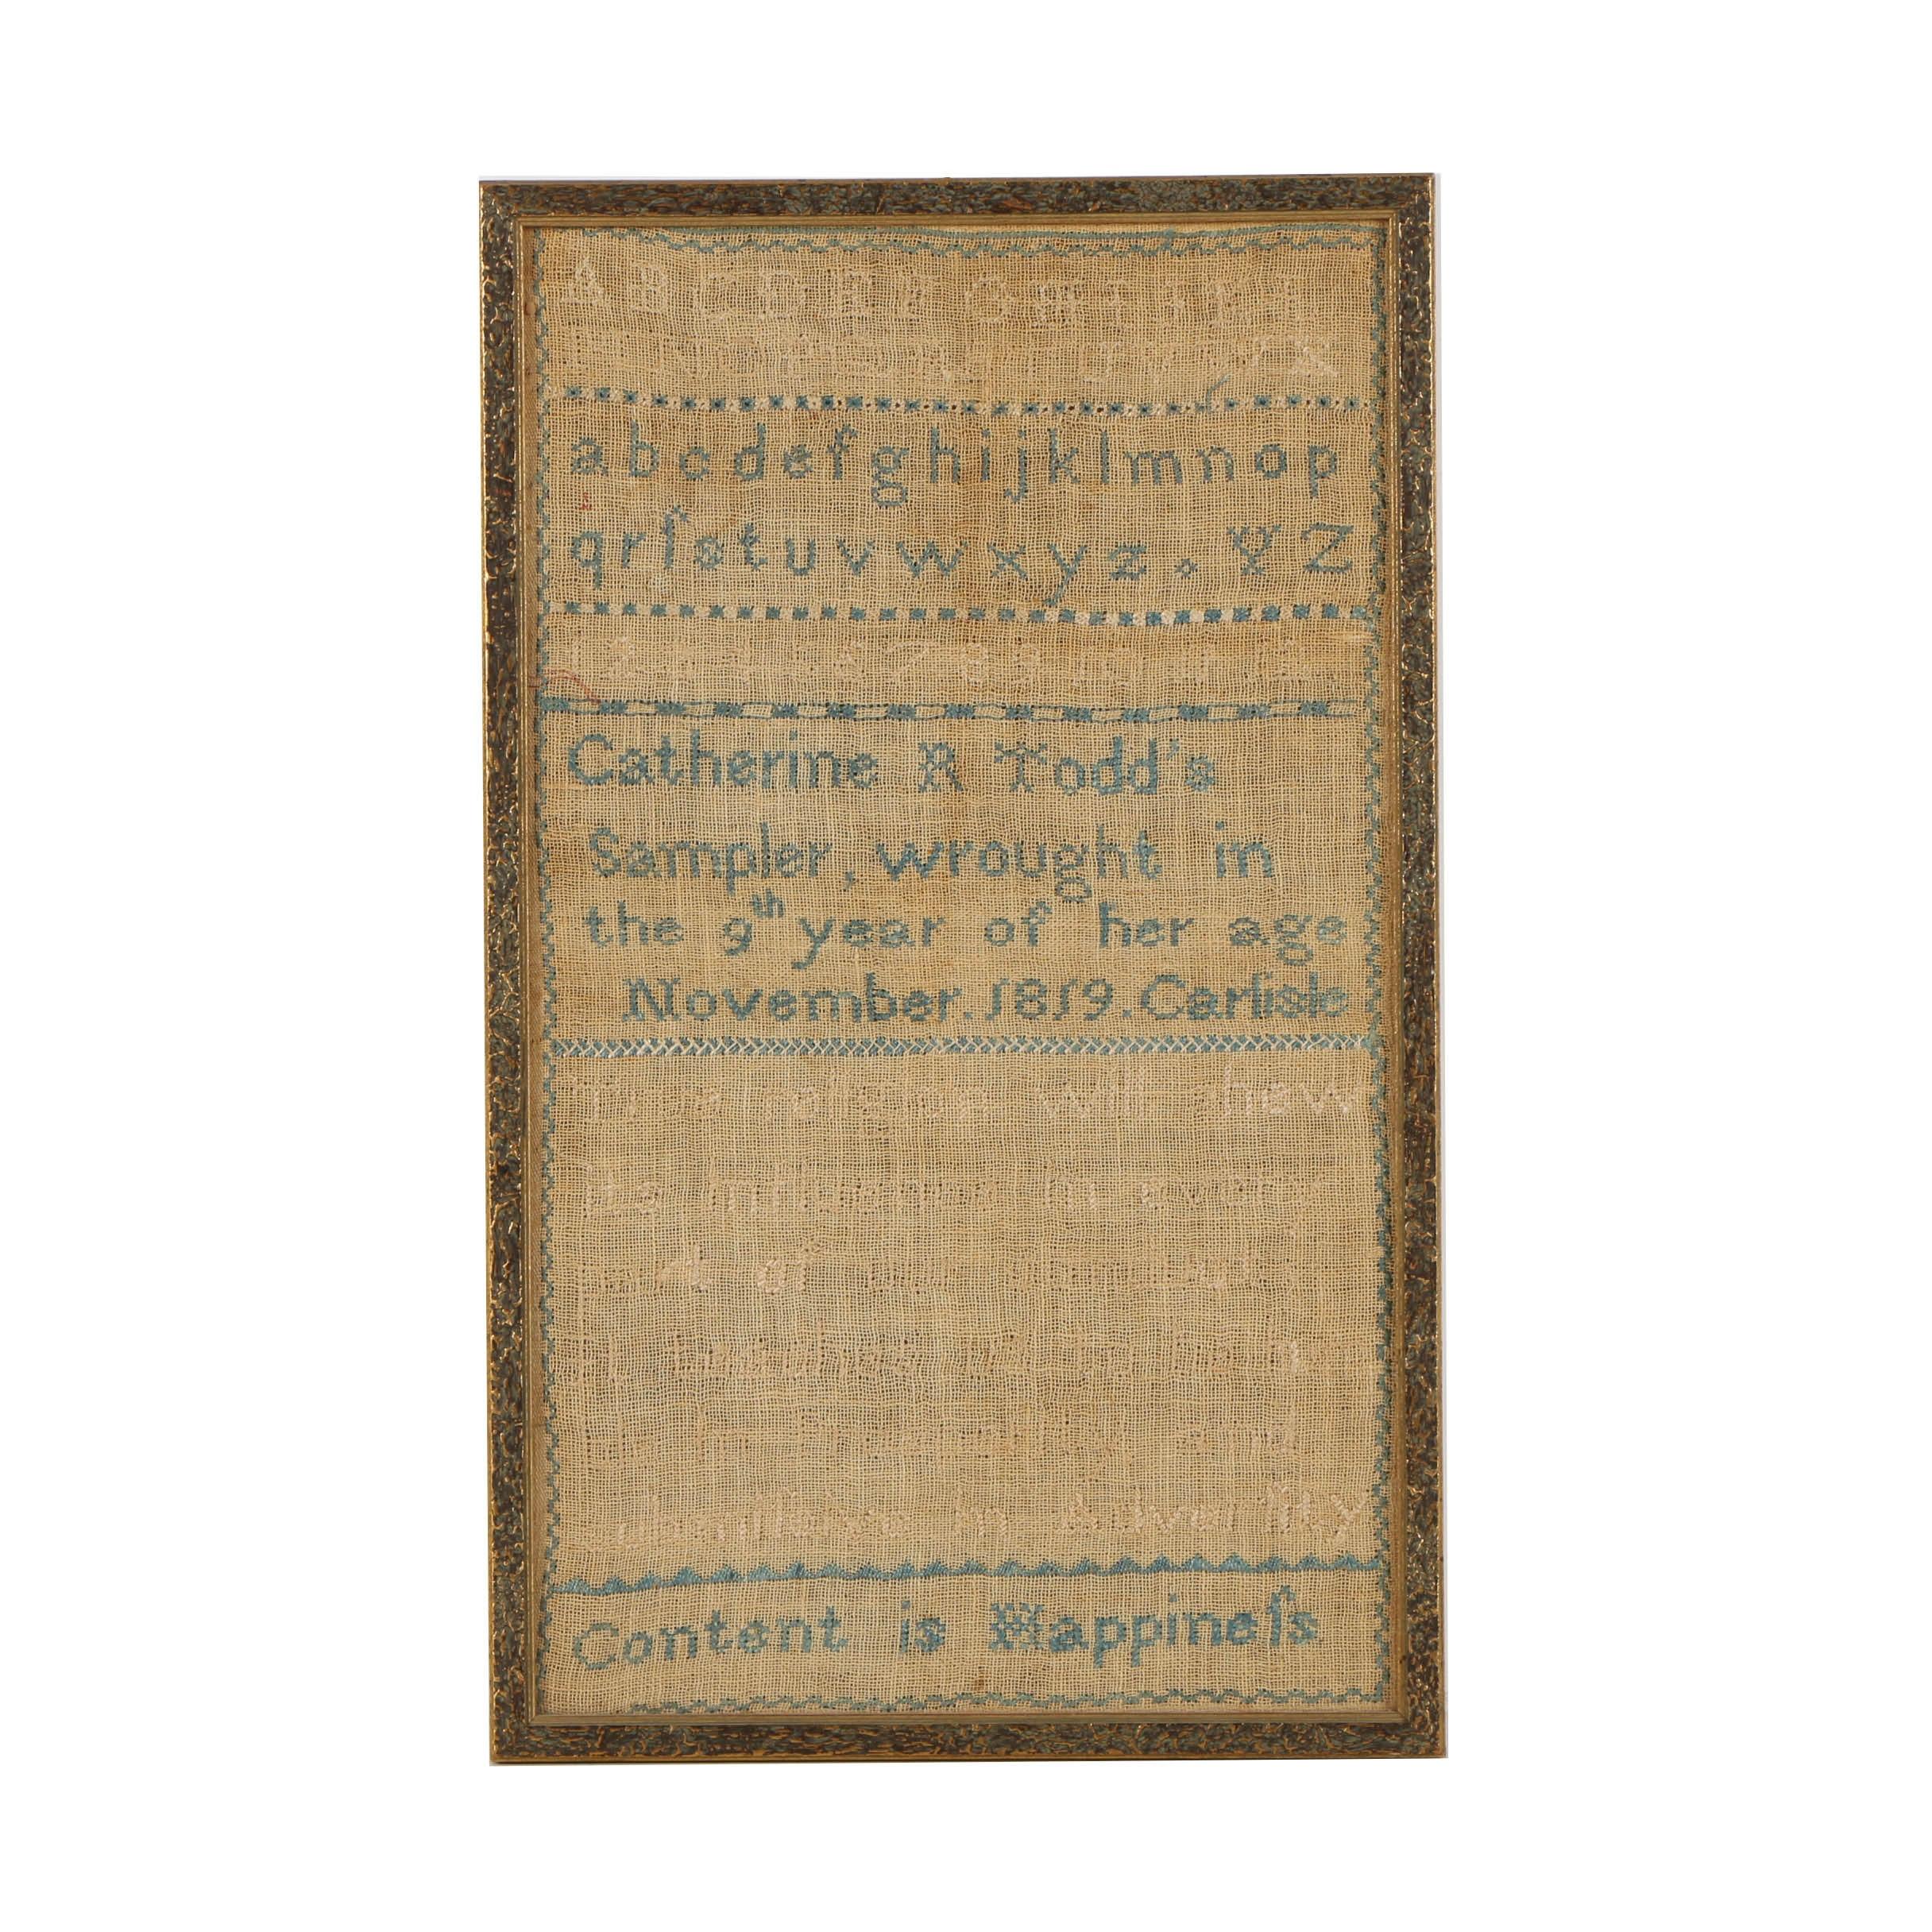 Antique Cross-Stitch Sampler on Linen Circa 1819